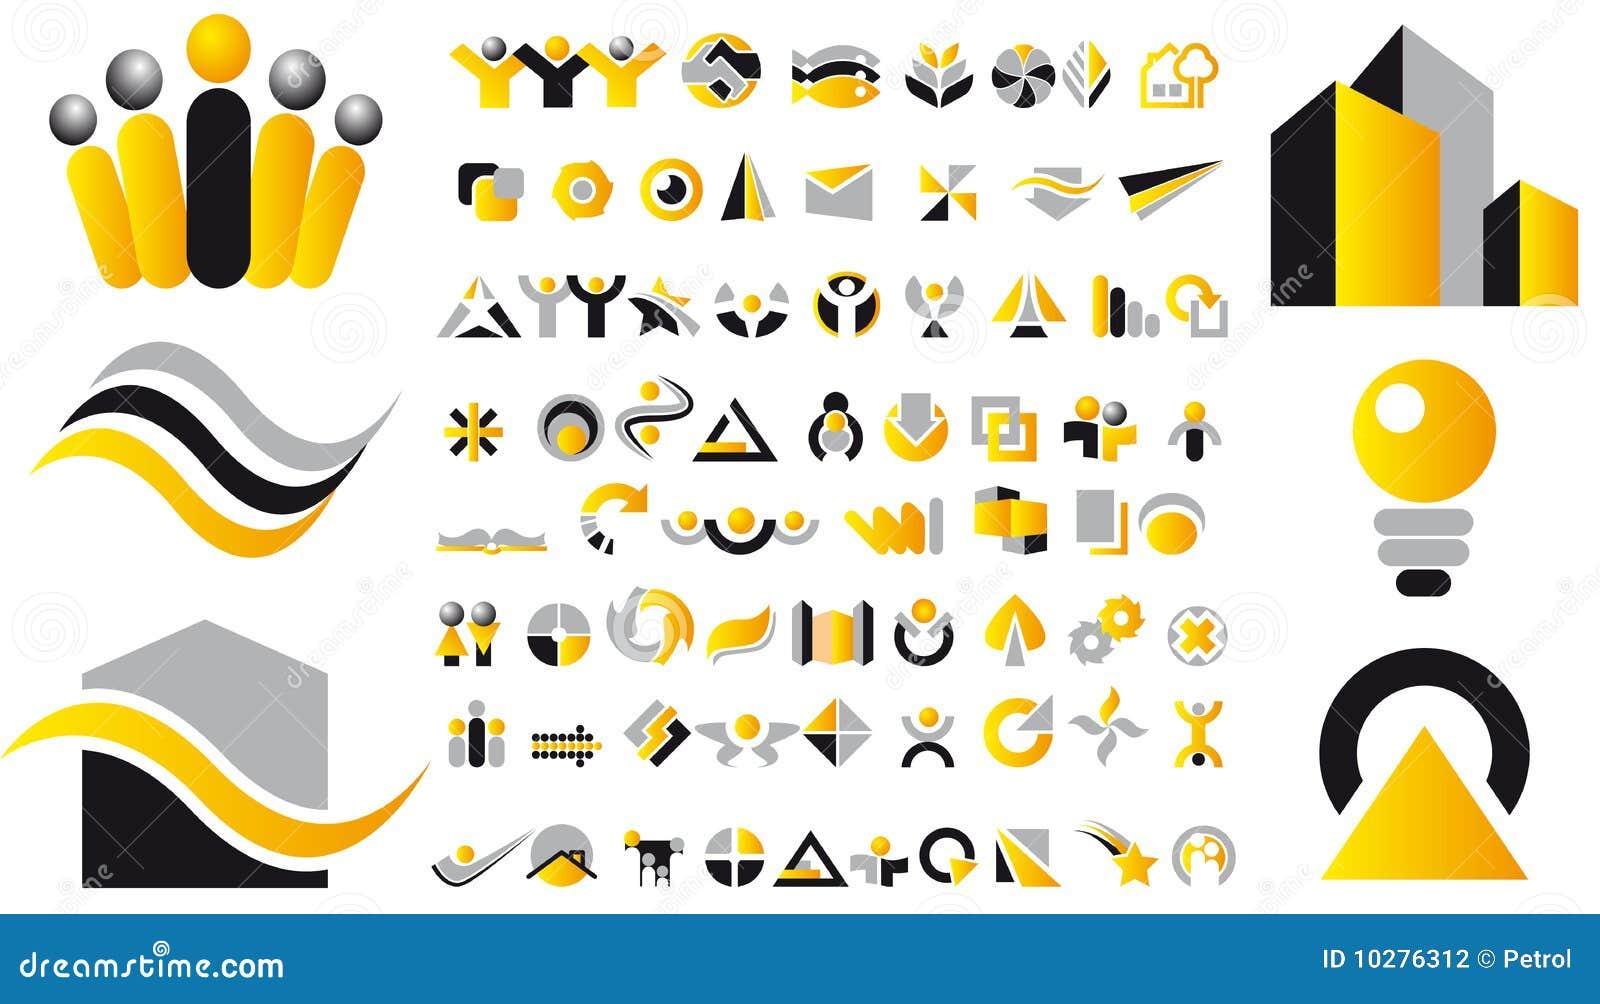 YouiDraw Online Vector Graphic Design Drawing Online